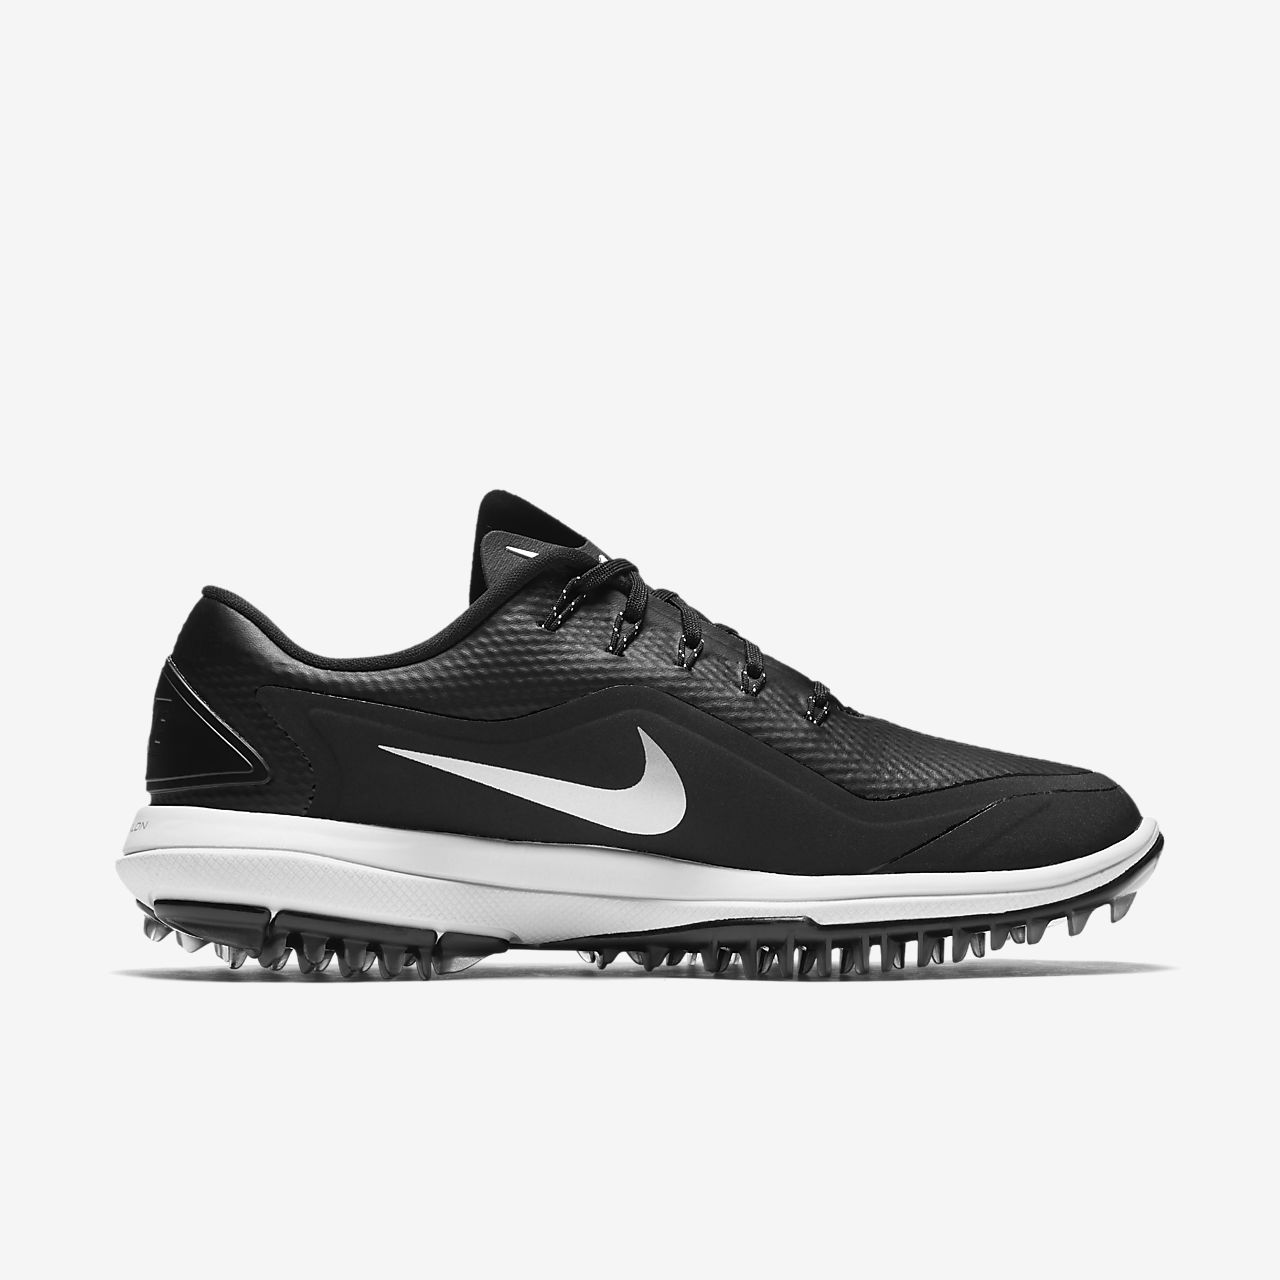 Nike Damen Wmns Lunar Command 2 Boa Golfschuhe, Schwarz (Negro 001), 38.5 EU